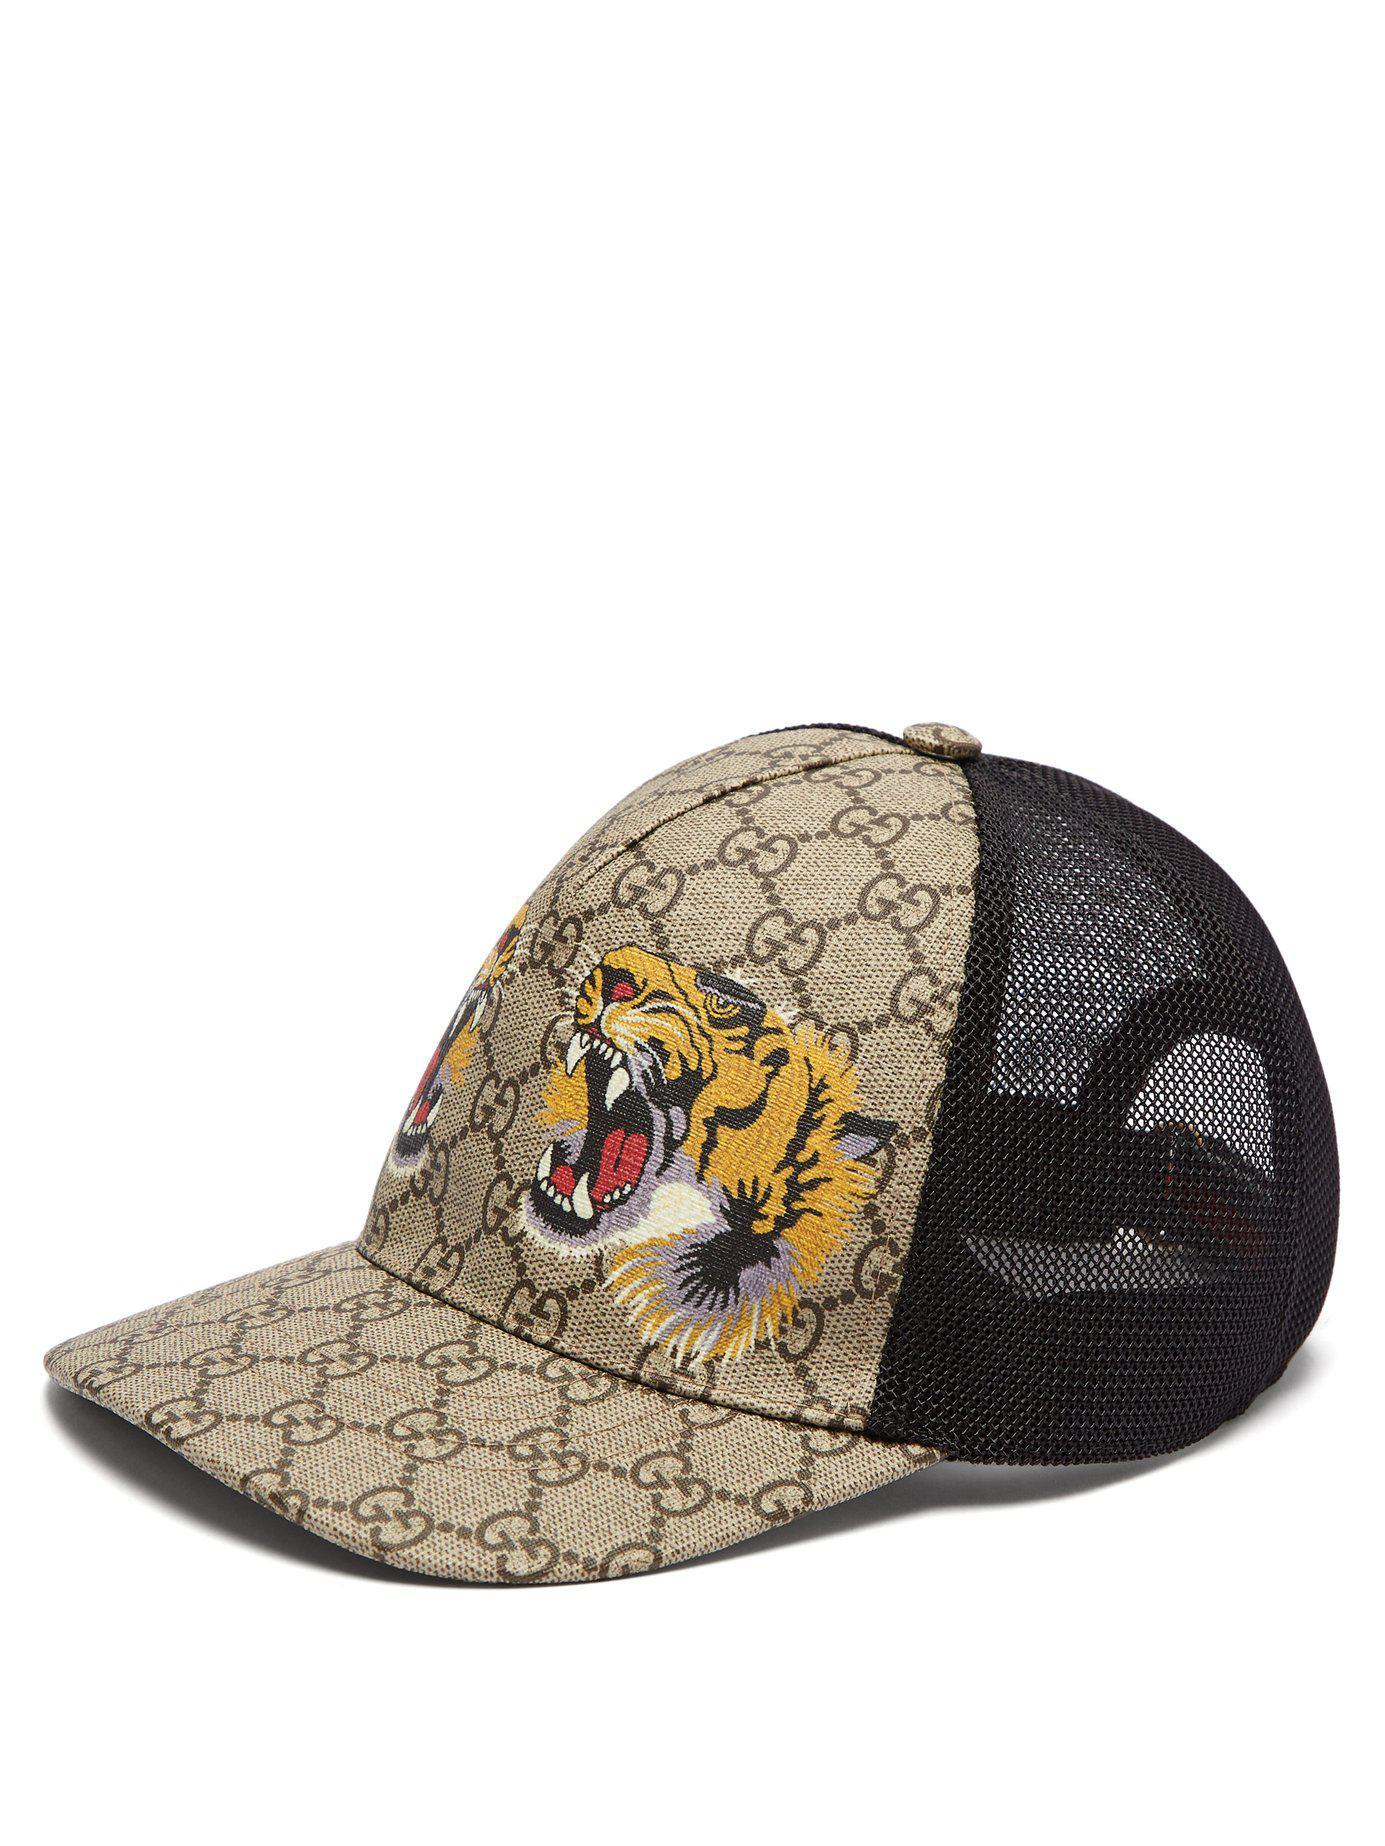 Lyst - Gucci Gg Supreme And Tiger Print Mesh Cap in Natural for Men cbf40fd8b519